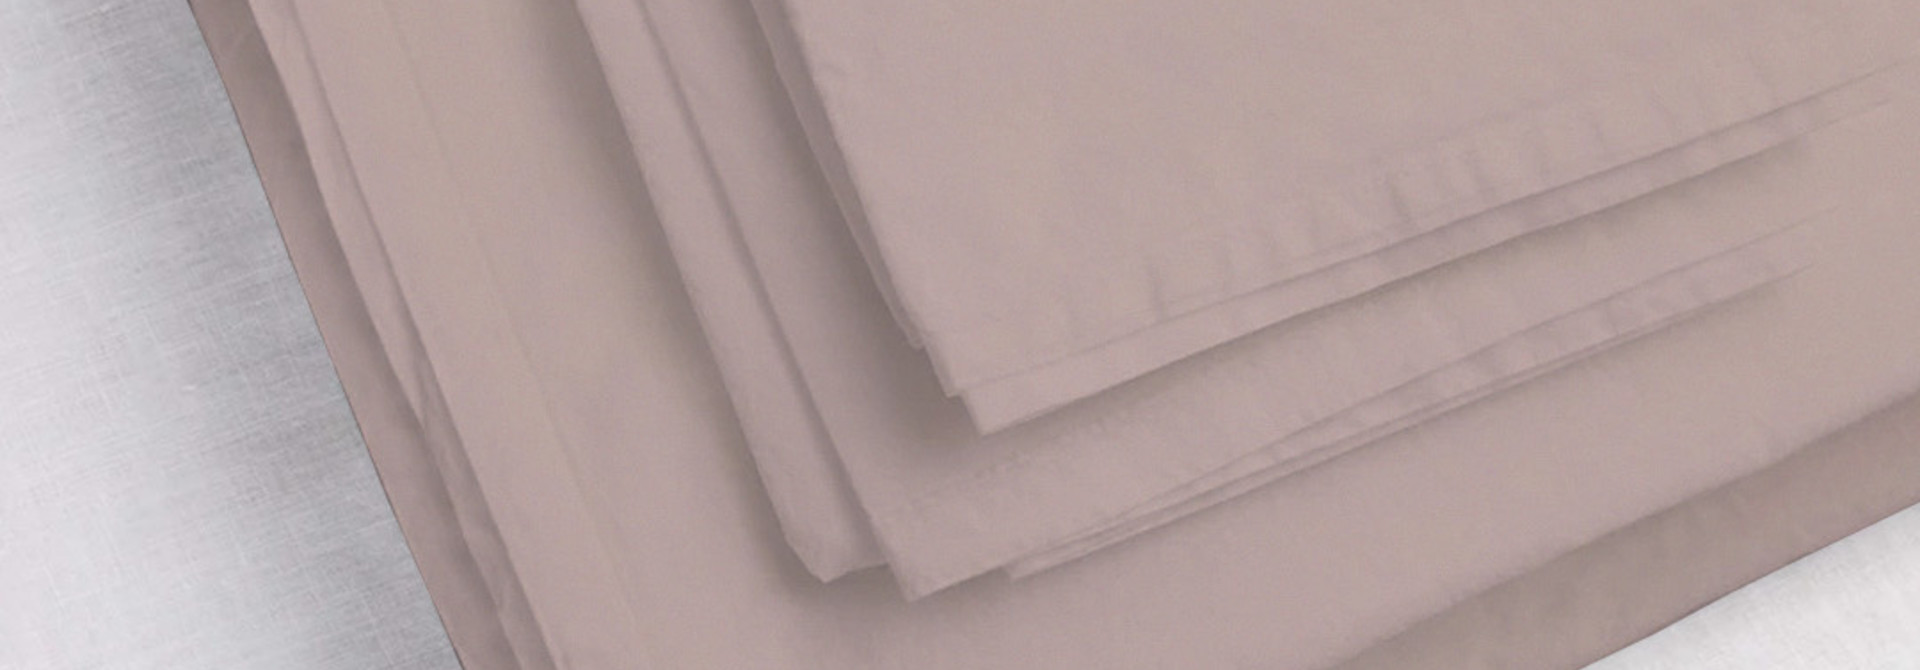 Pillowcase Sham King - Mauve